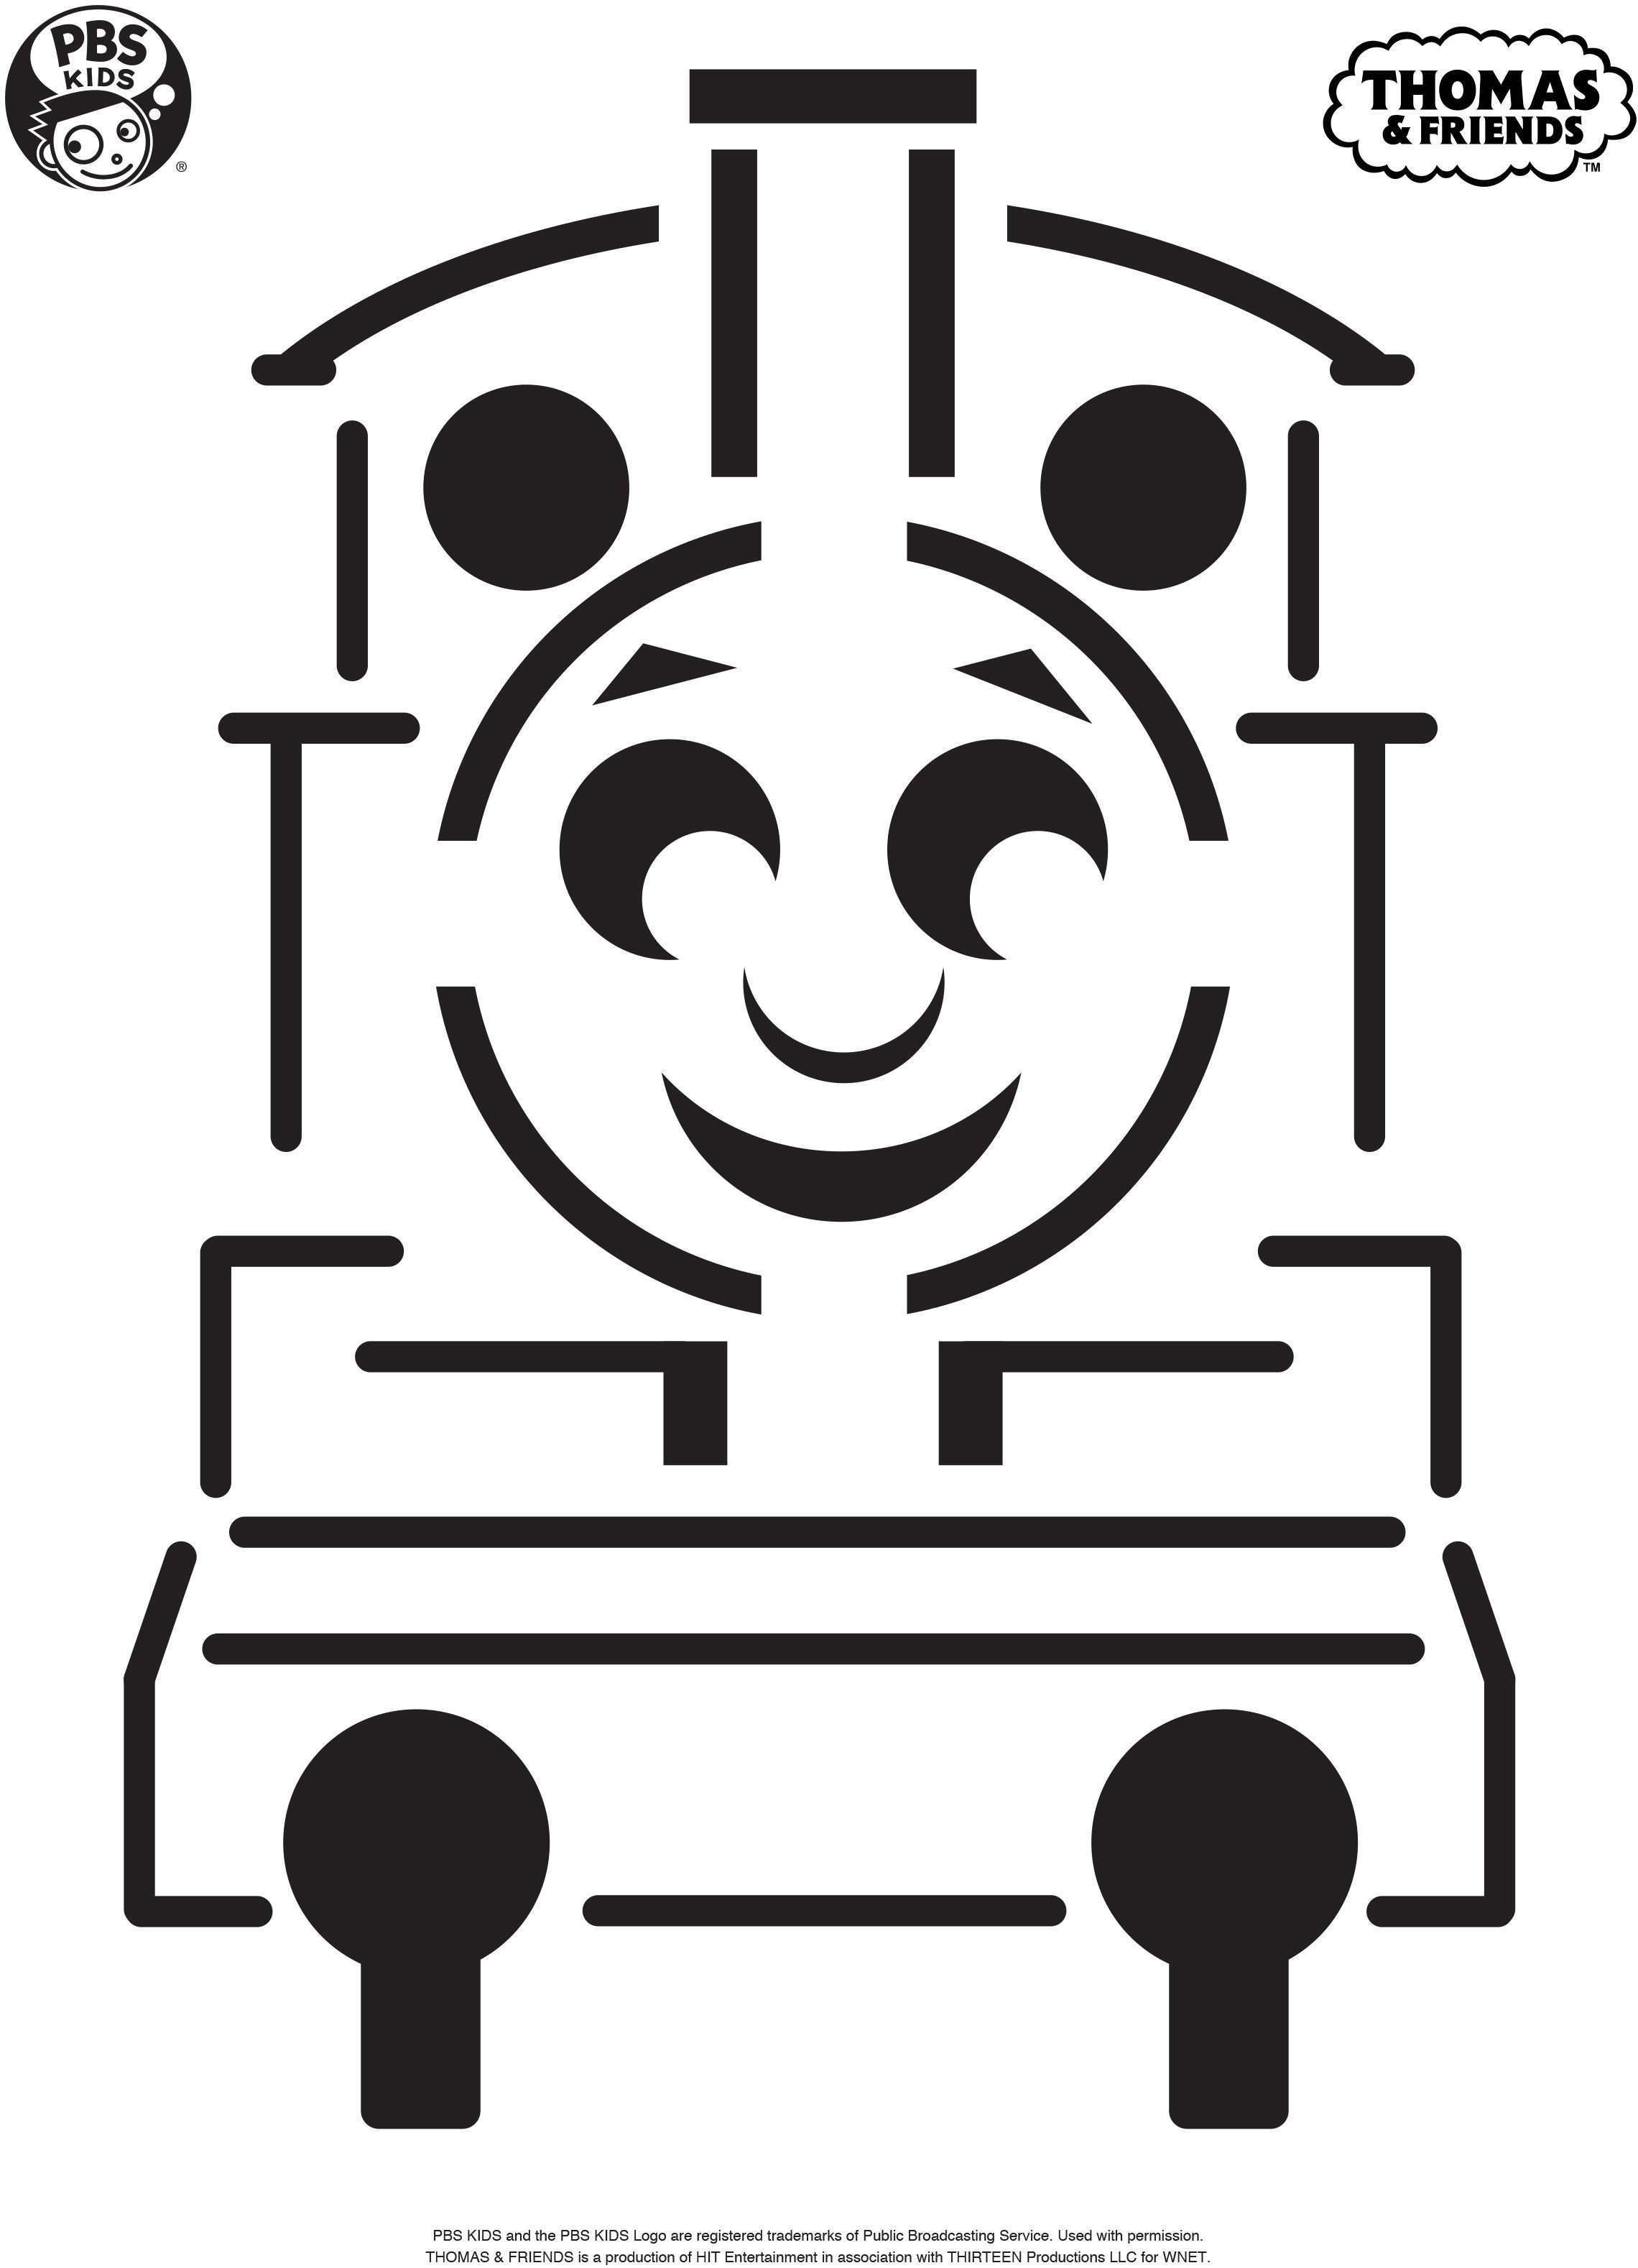 Make a Thomas the Tank Engine pumpkin with this pumpkin carving ...